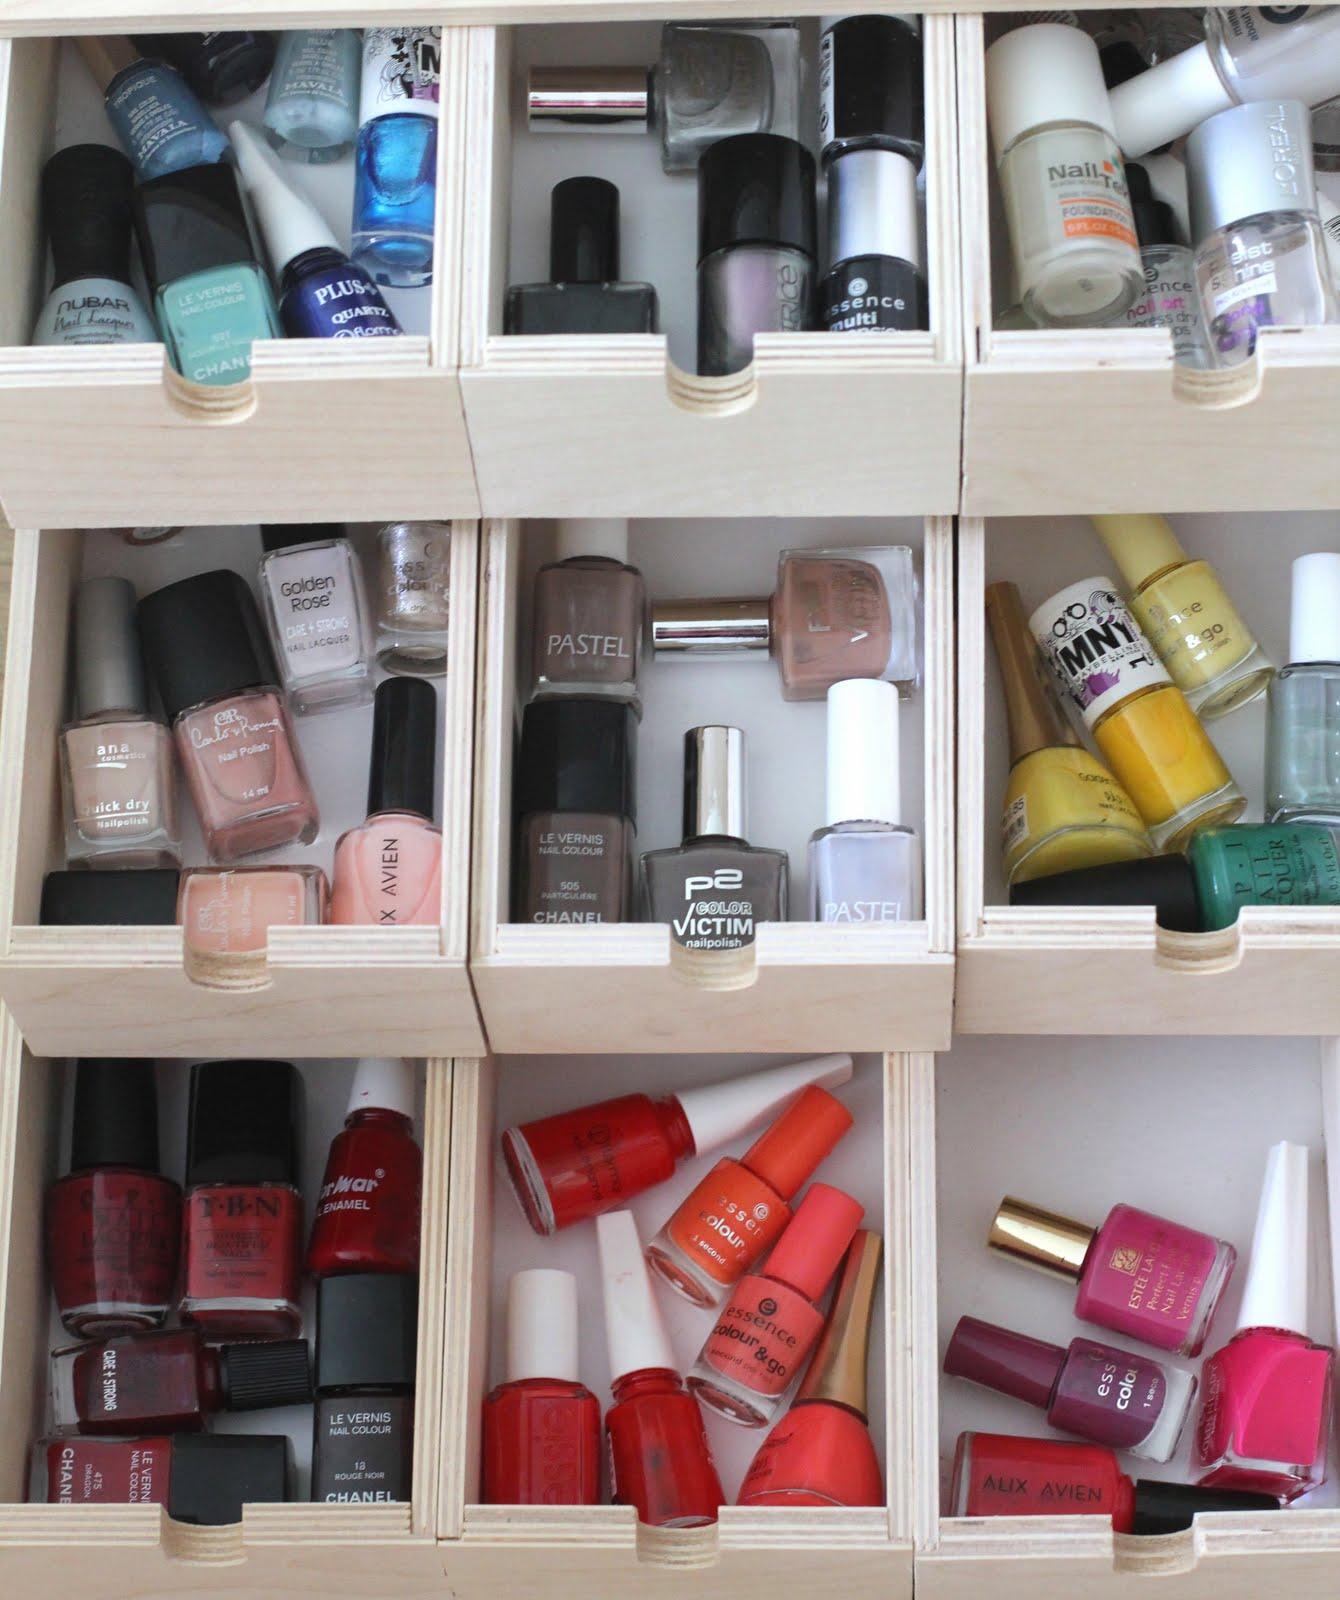 Thursday S Beauty Post Organizing Makeup Styleseeking